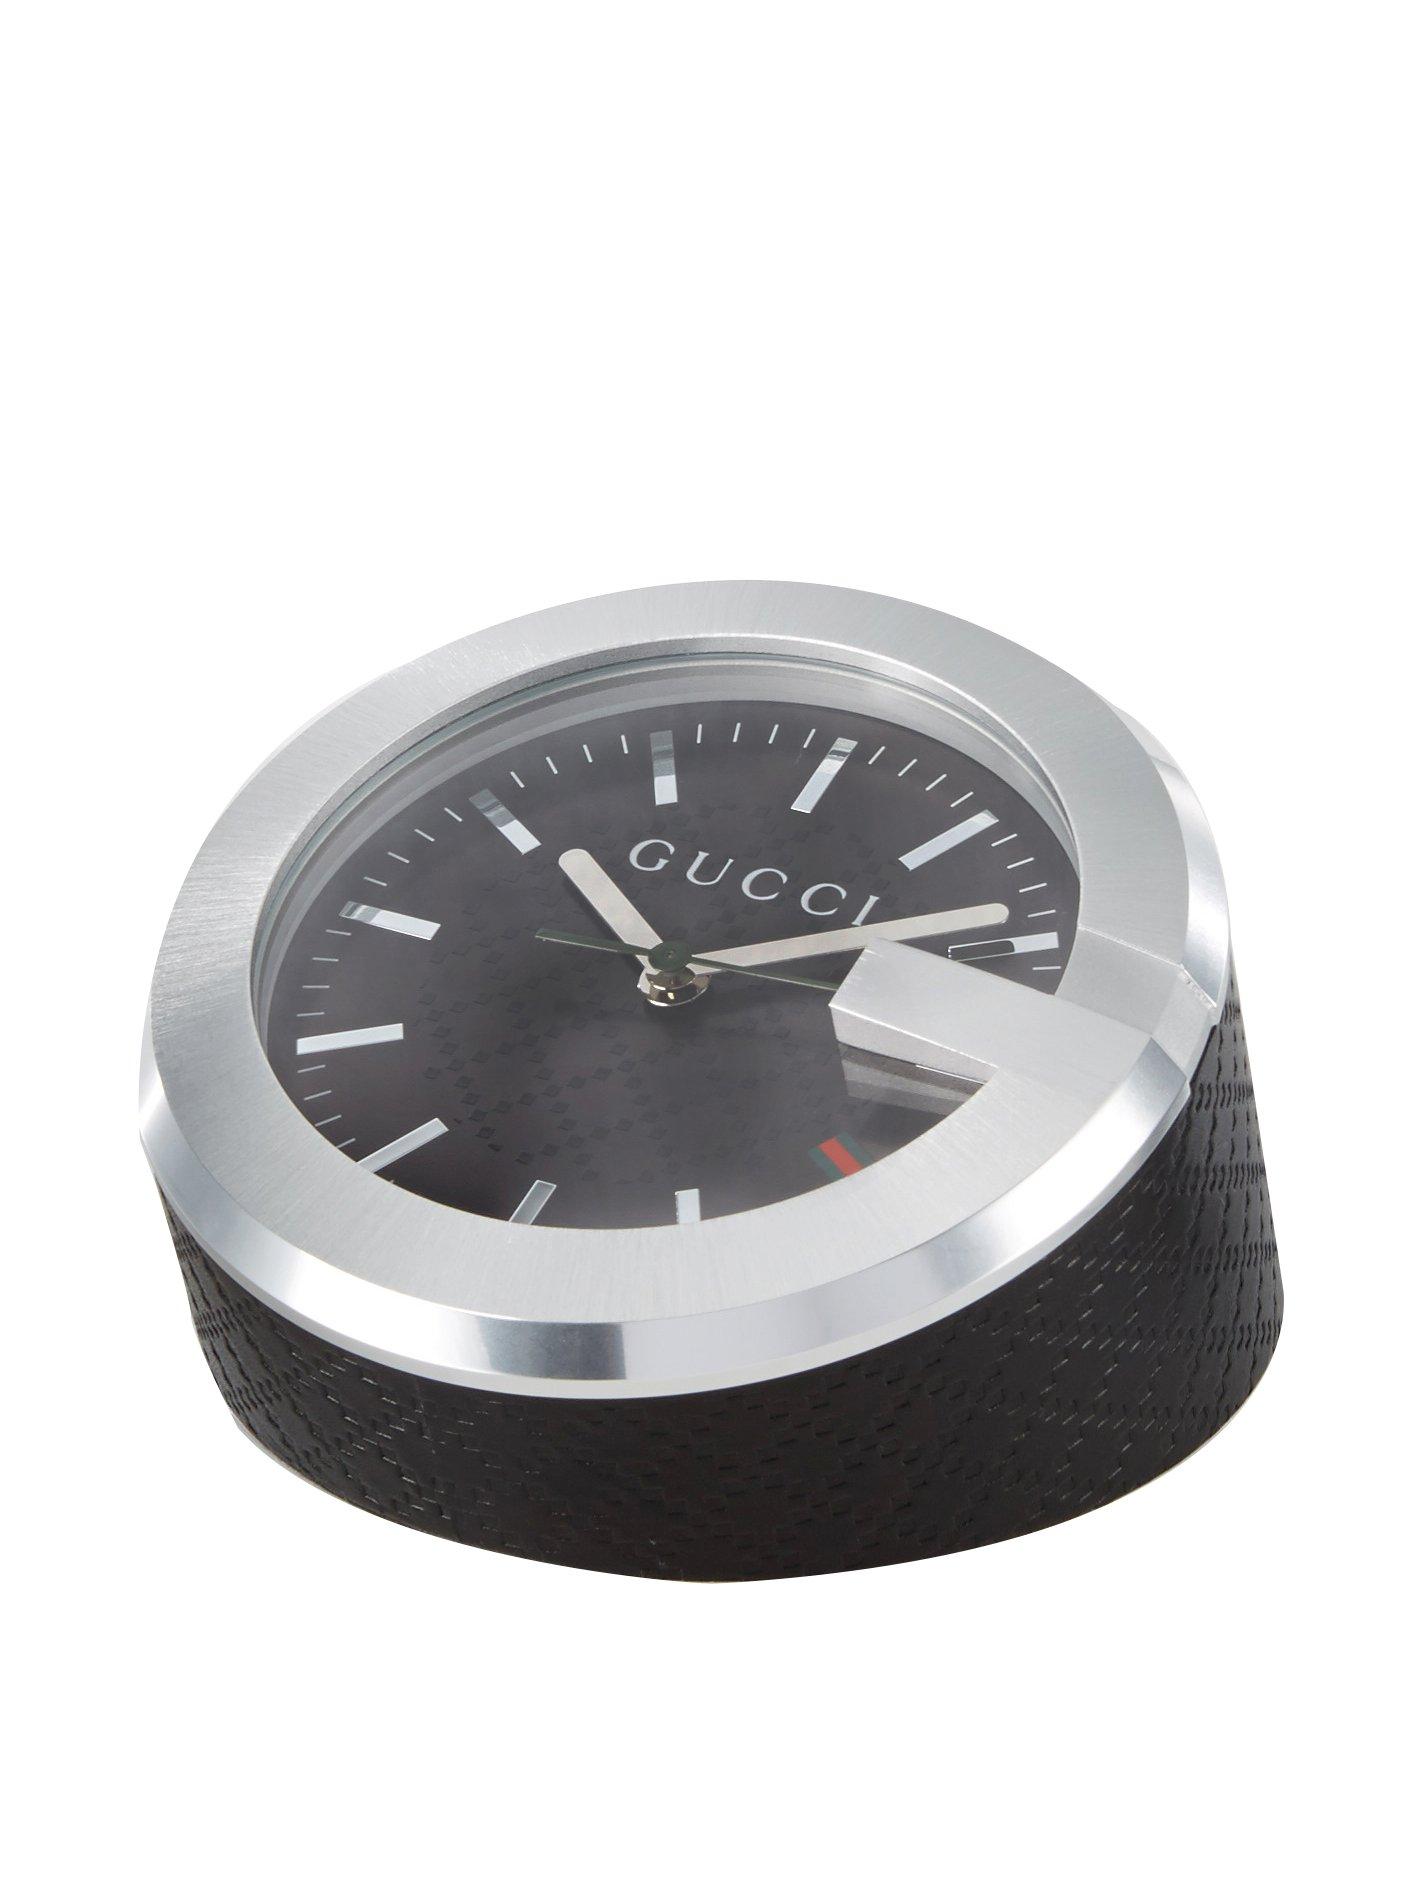 GUCCI Black Diamond Table Clock $99 + free s/h